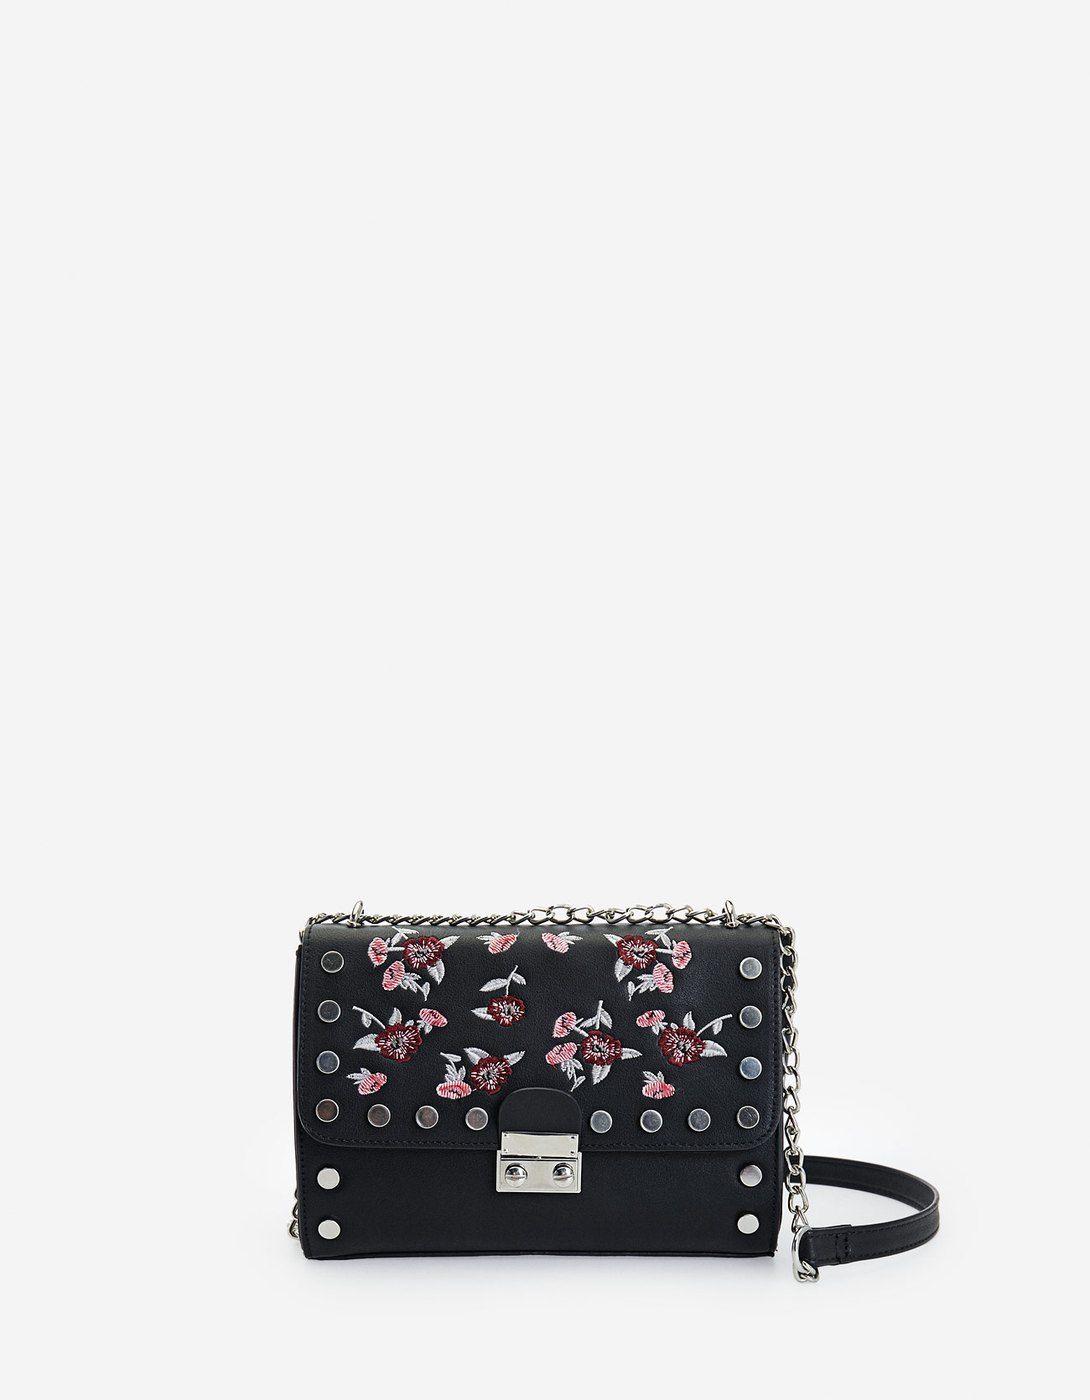 02aa4468a6b2 Τσάντα χιαστί με κεντημένα λουλούδια - Πουκαμισα | Stradivarius Greek